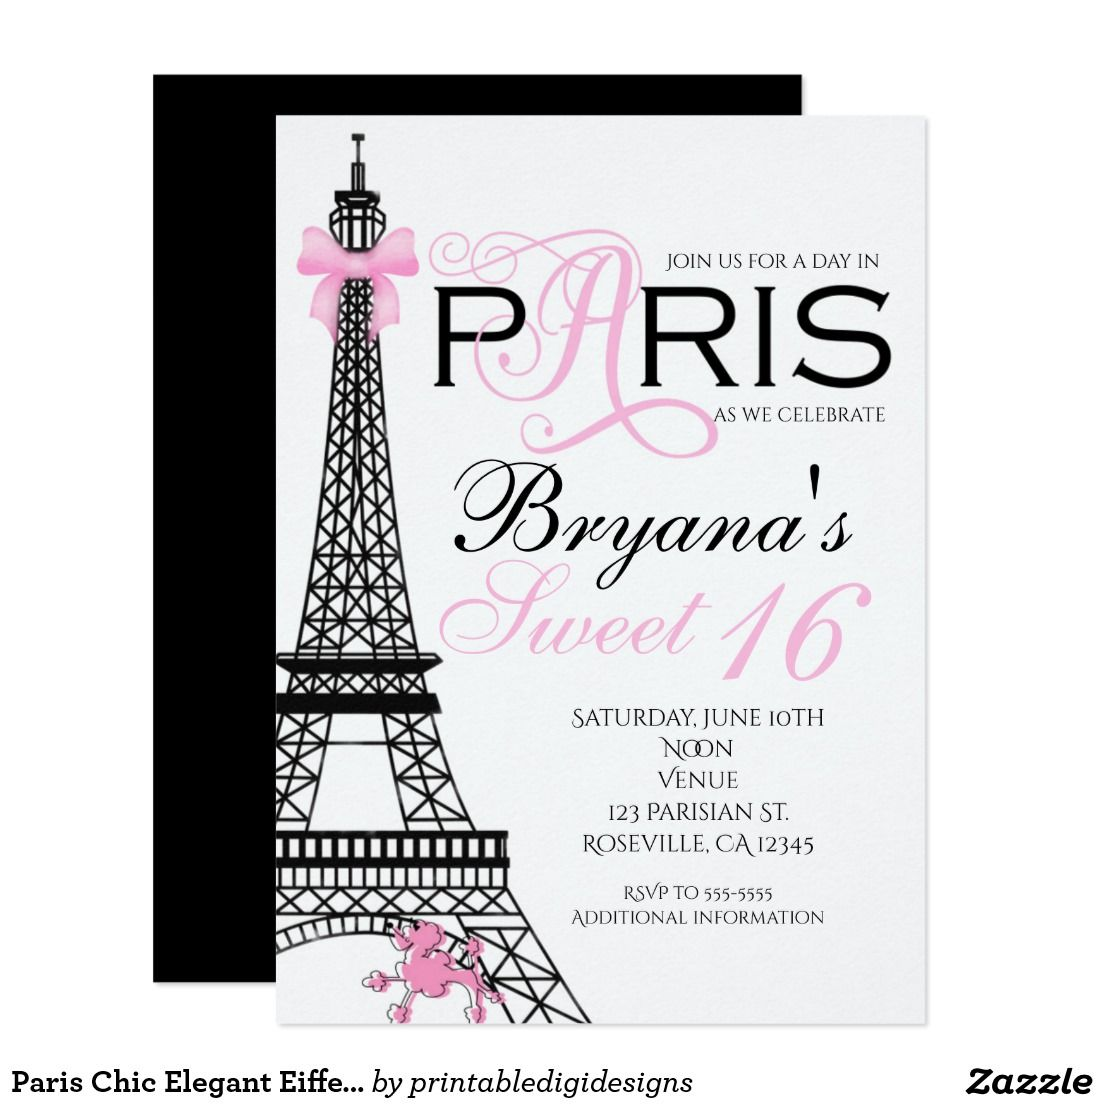 Paris Chic Elegant Pink & Black Party Invitations | Sweet 16 ...